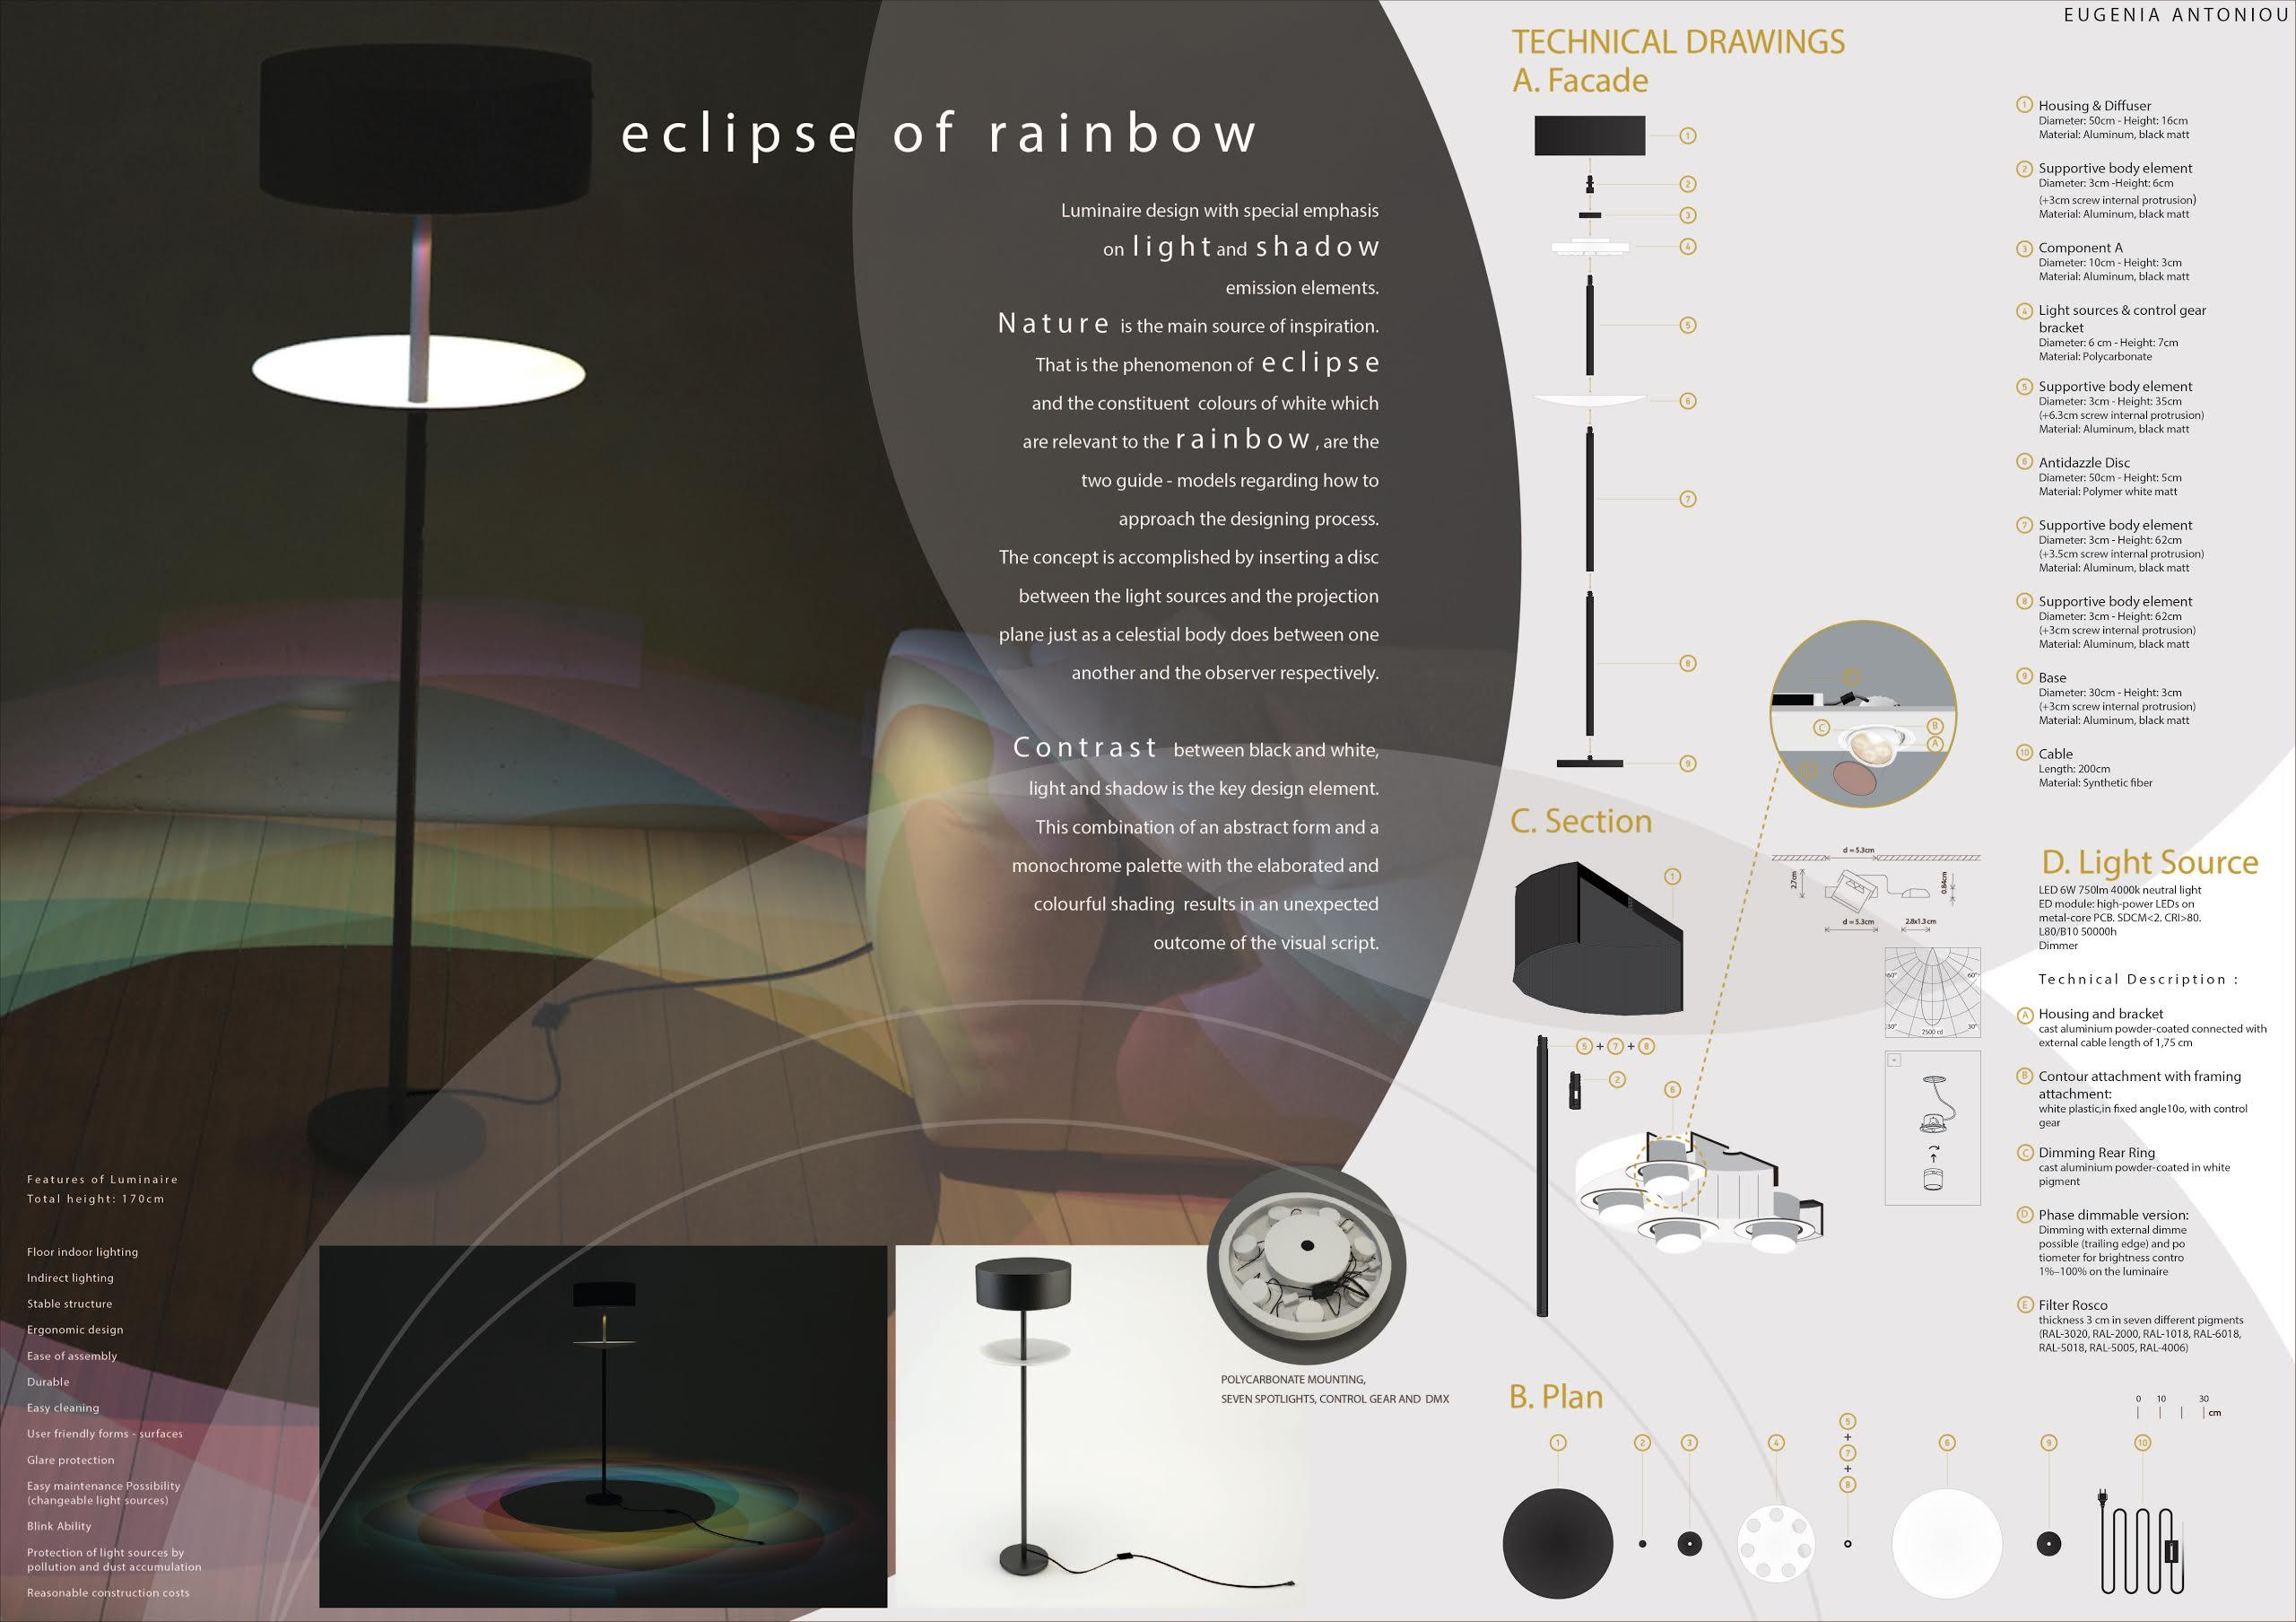 Eclipse-of-Rainbow-Eugenia-Antoniou-Sias-Blog-04